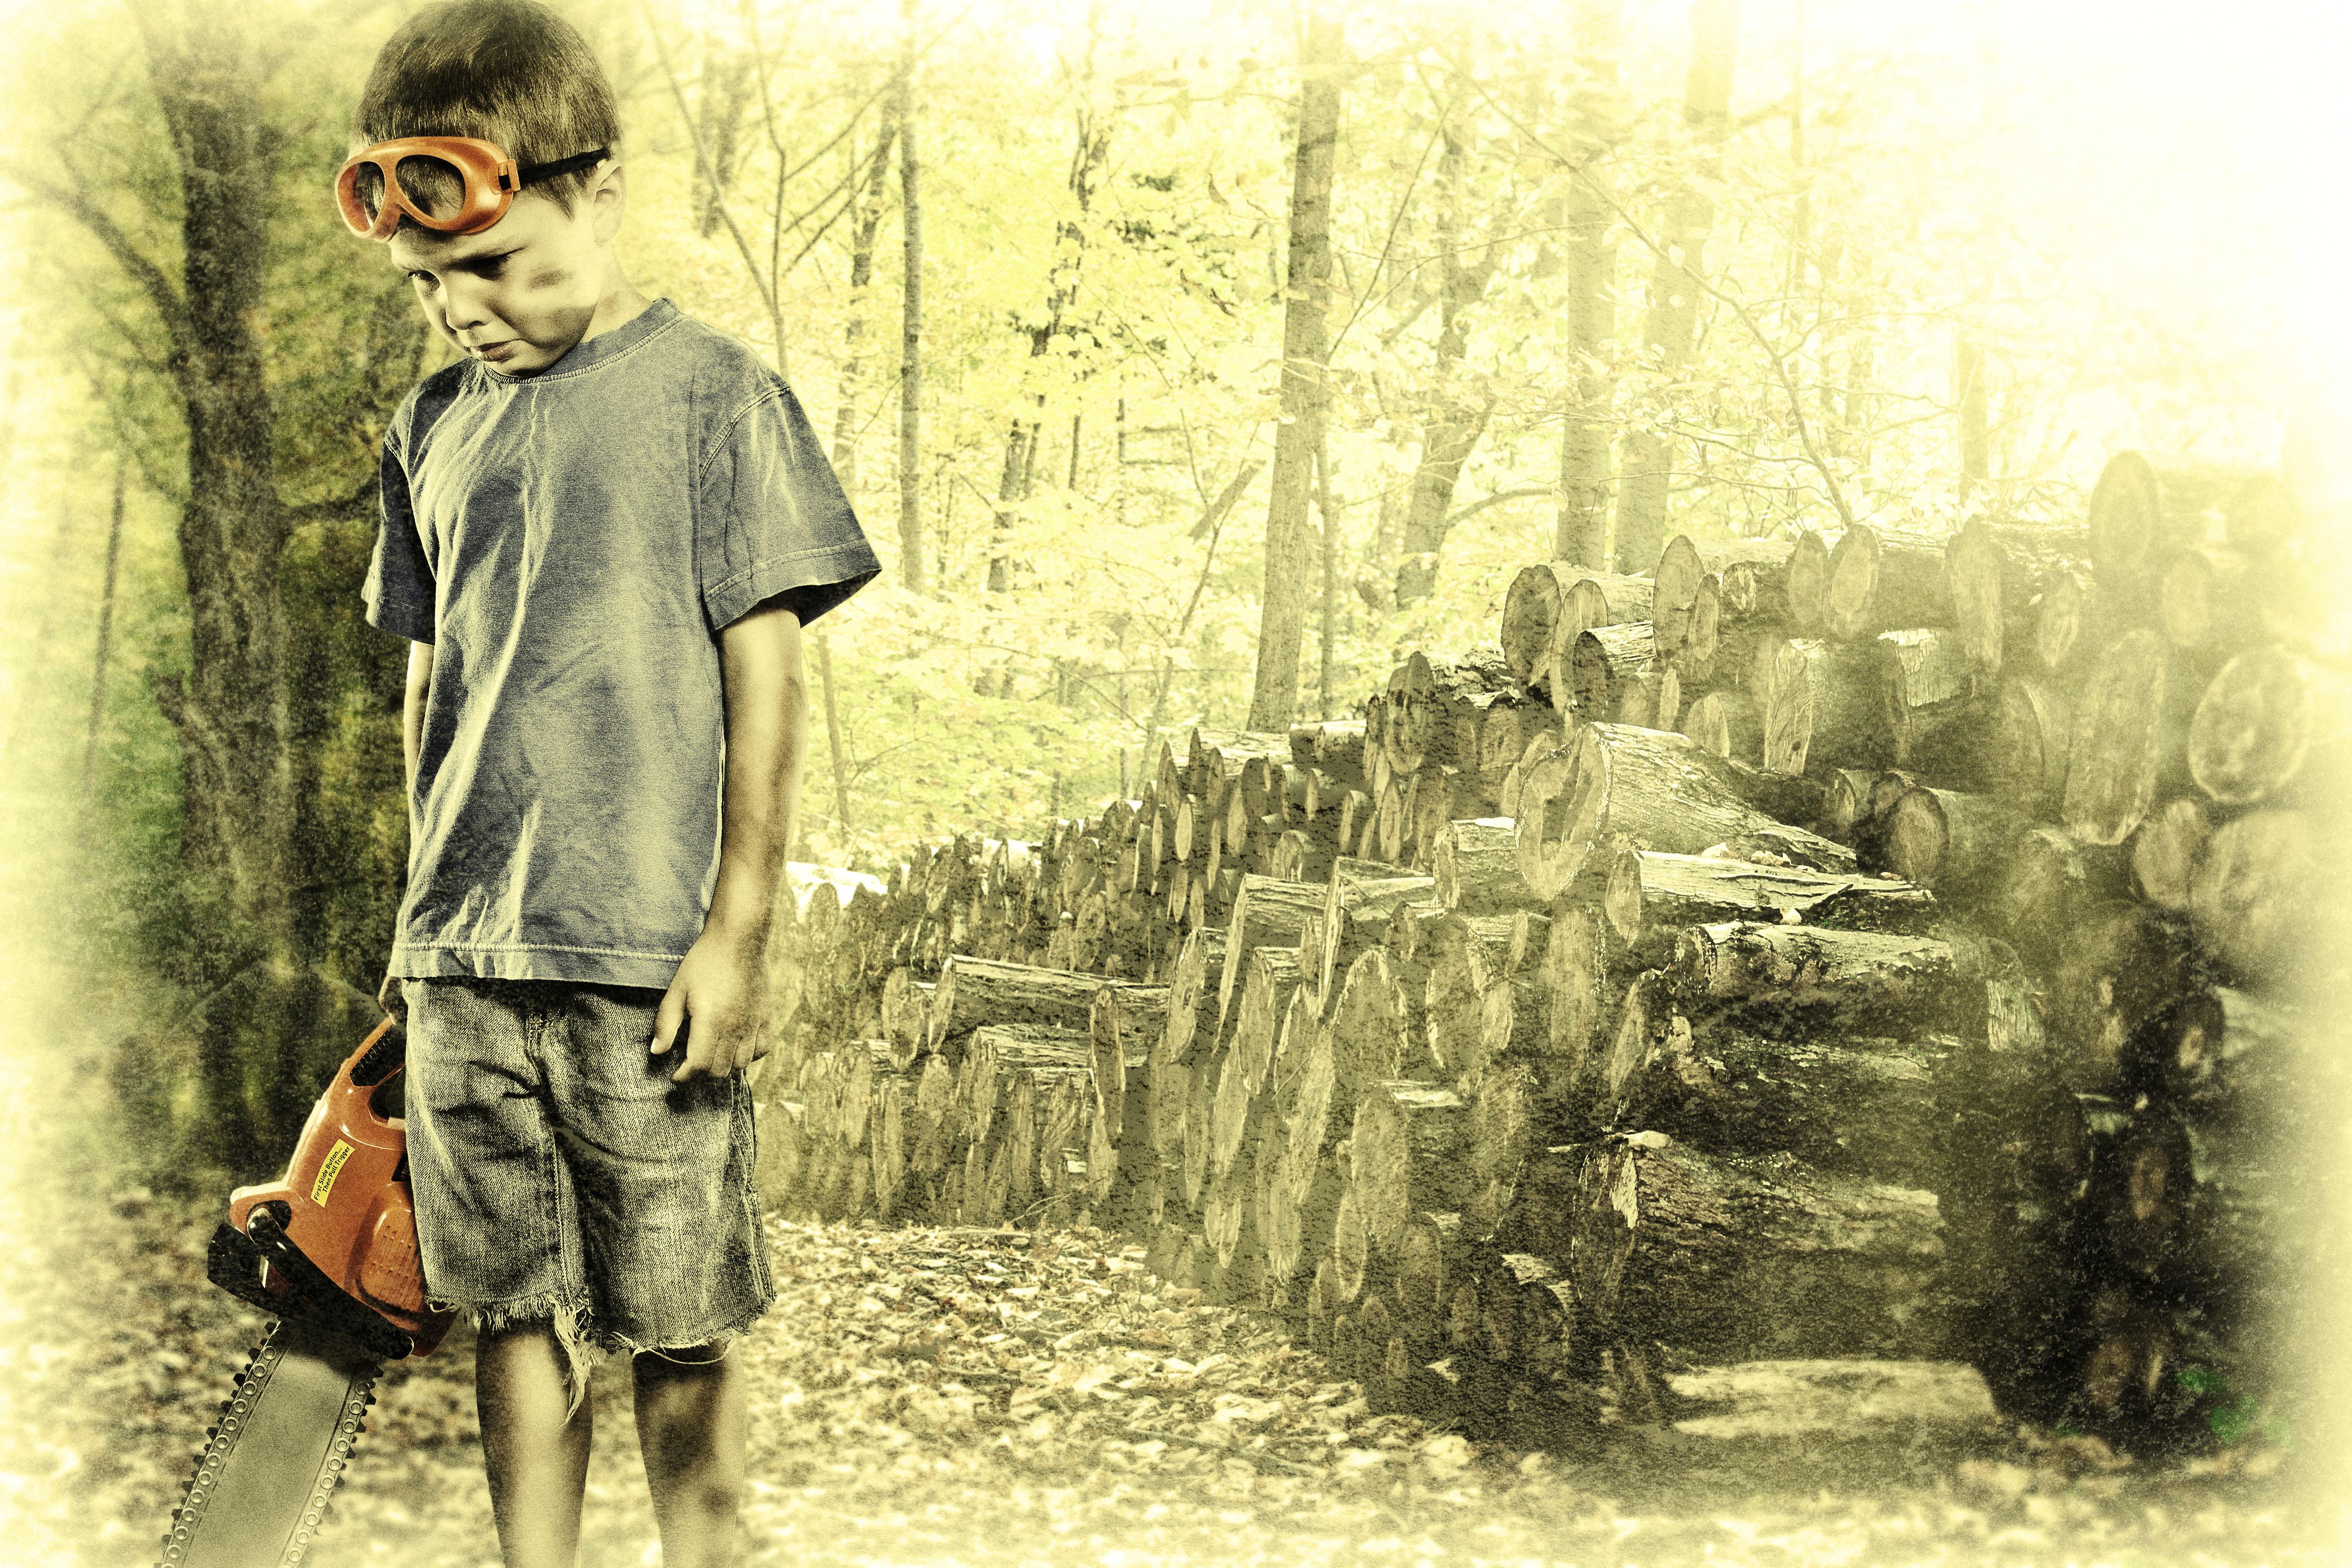 A Sad Lumberjack